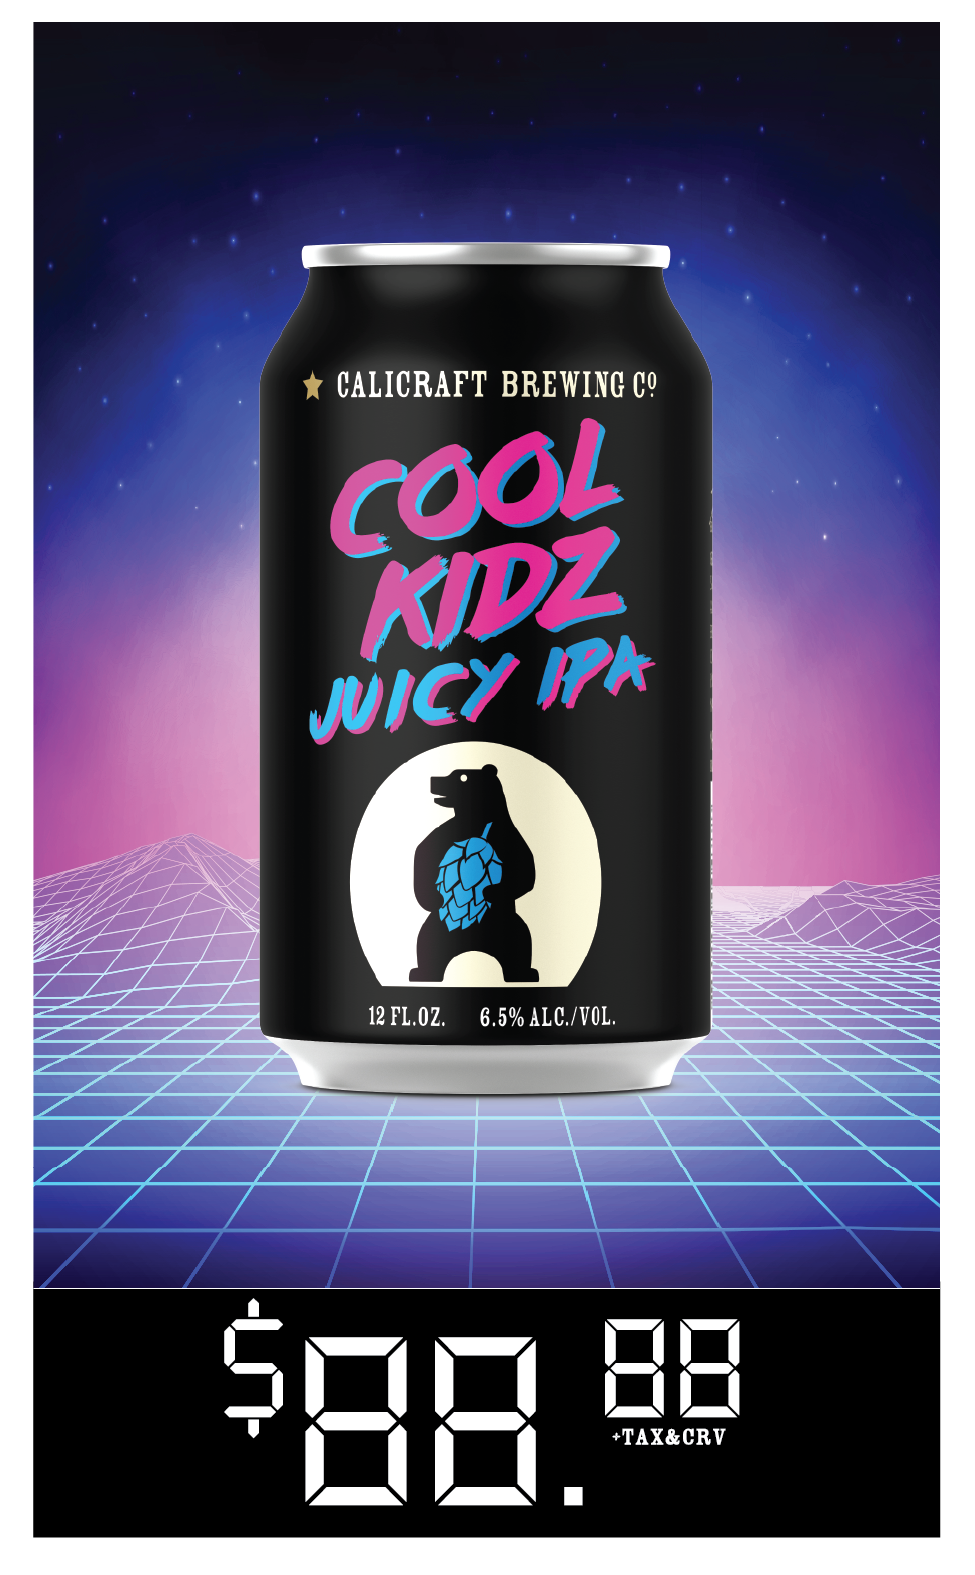 Cool Kidz 3x5-01.png